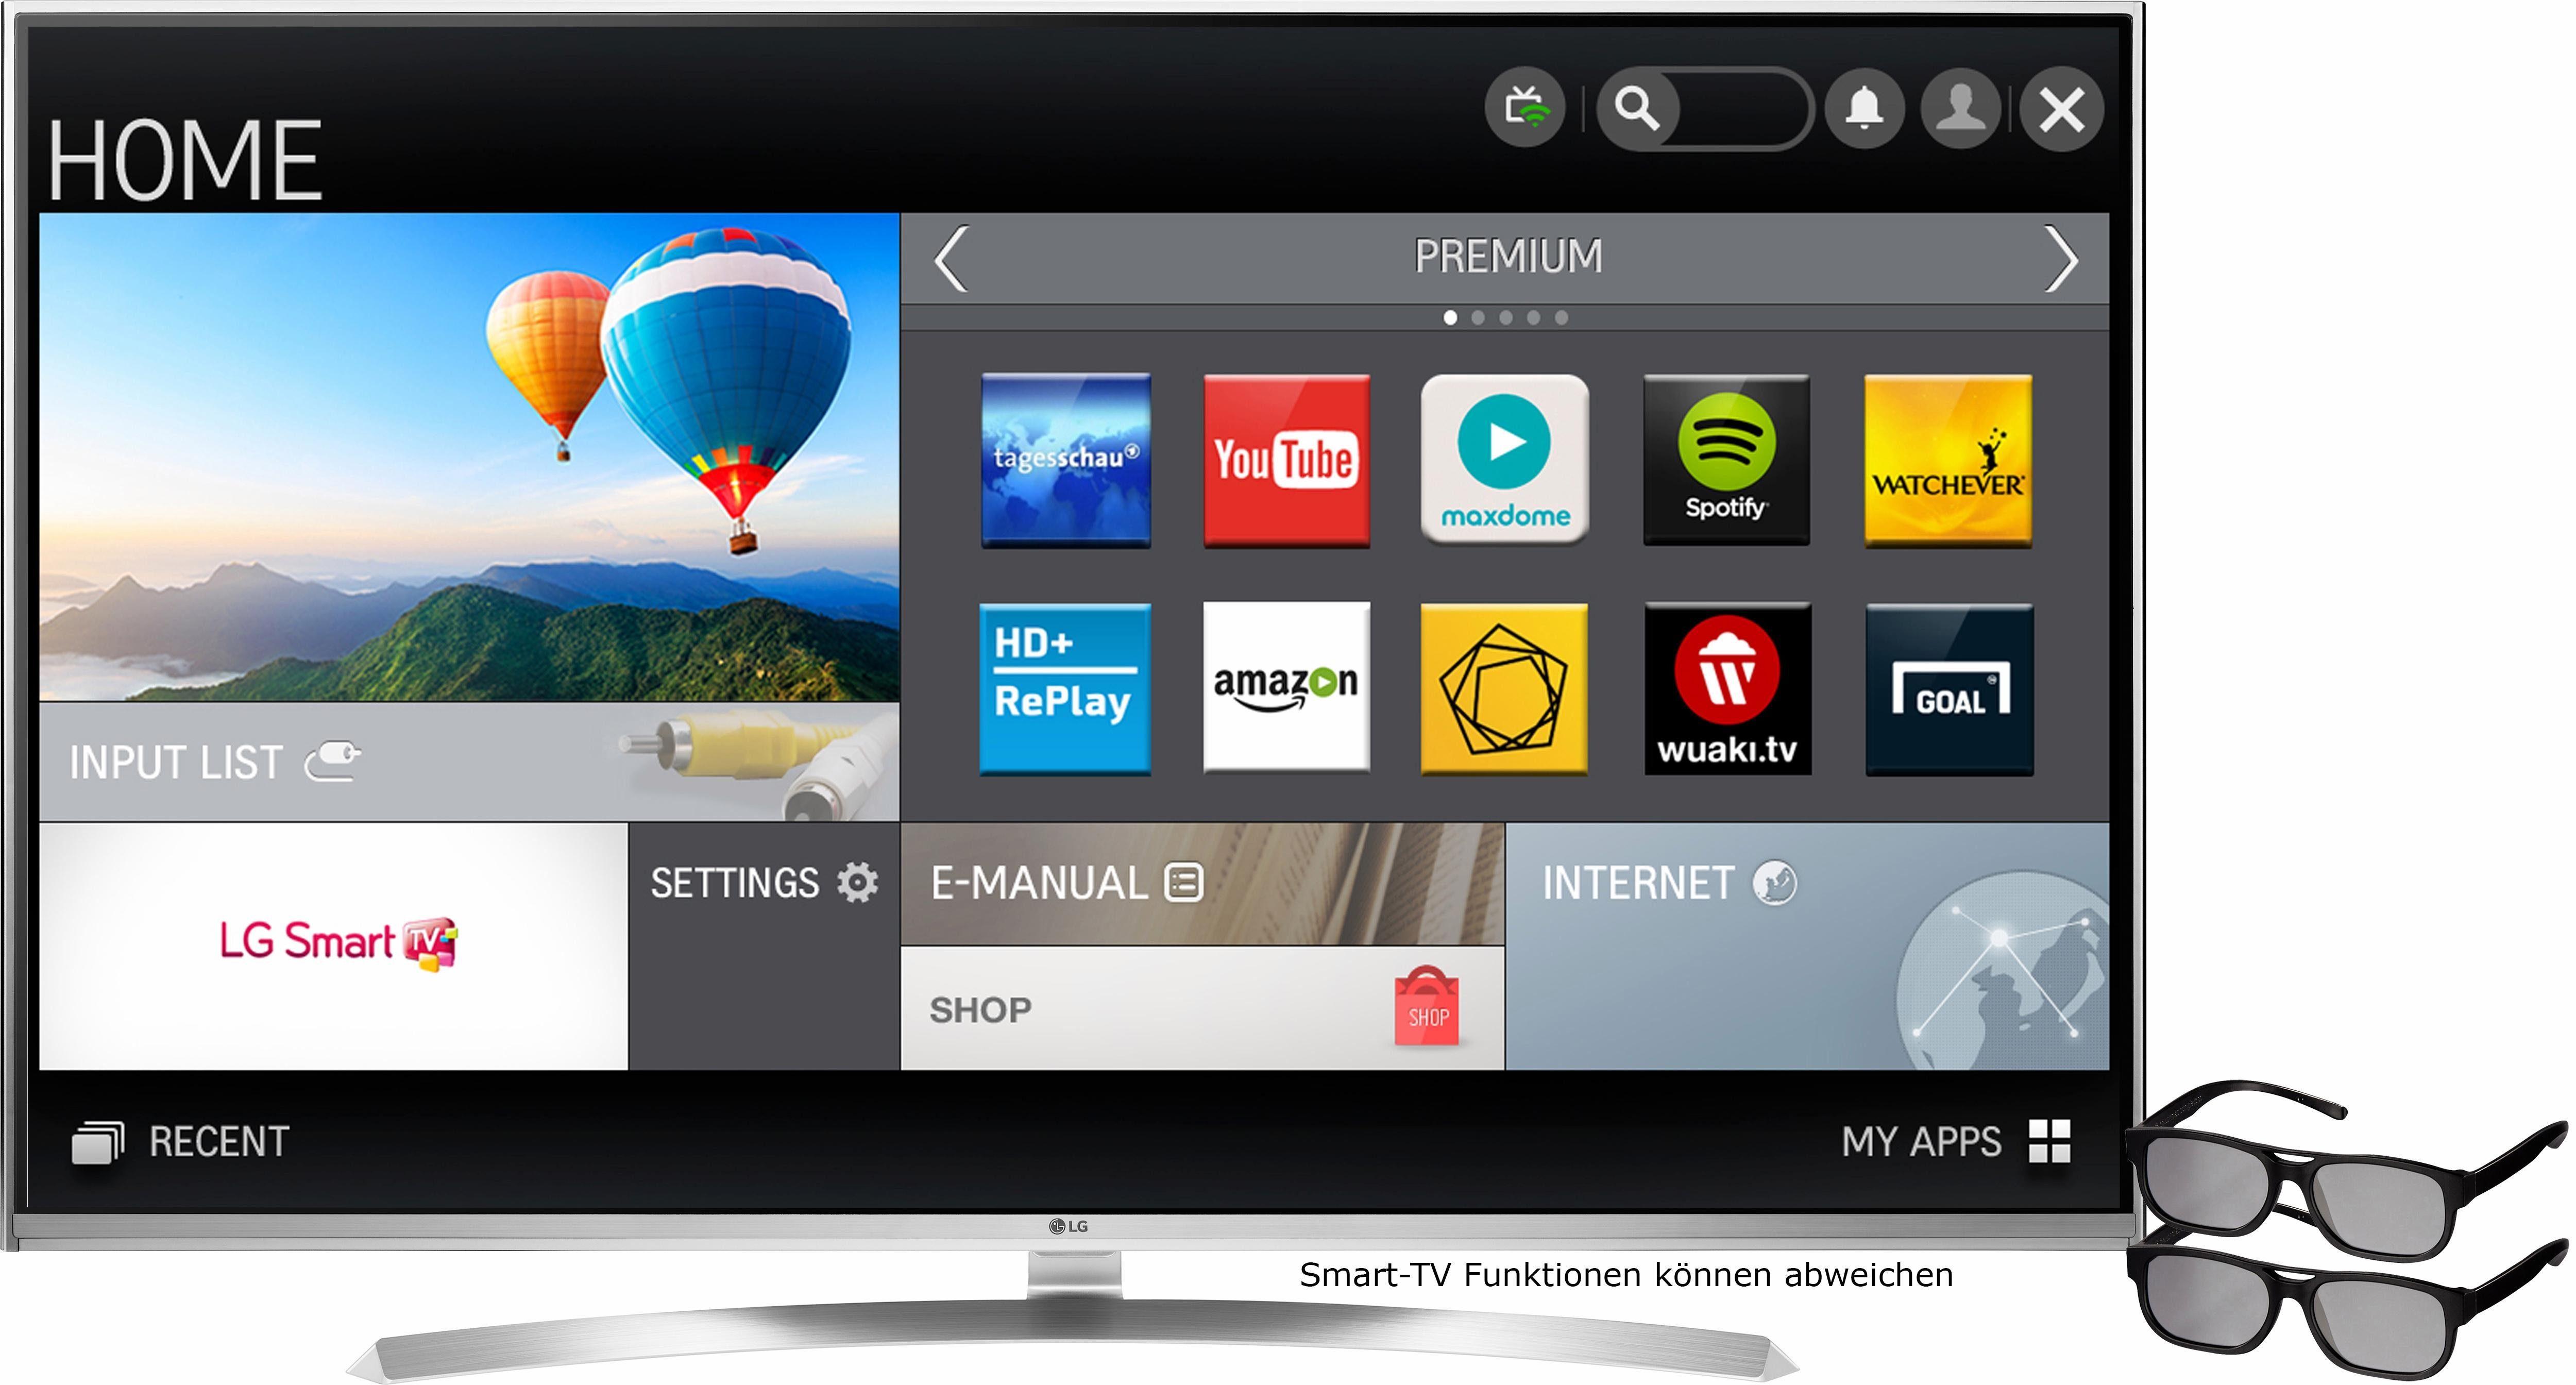 LG 55UH8509, LED Fernseher, 139 cm (55 Zoll), 2160p (4K Ultra HD), Smart-TV